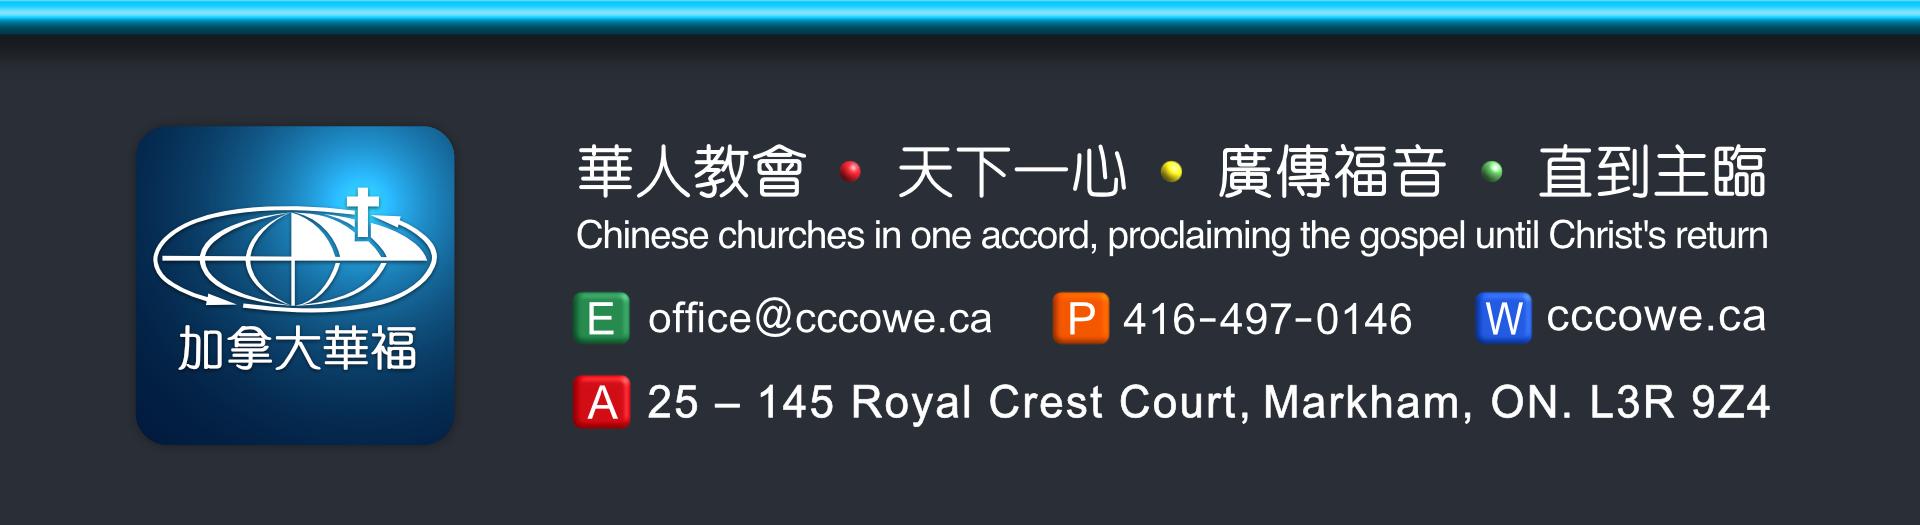 加拿大華福 Information